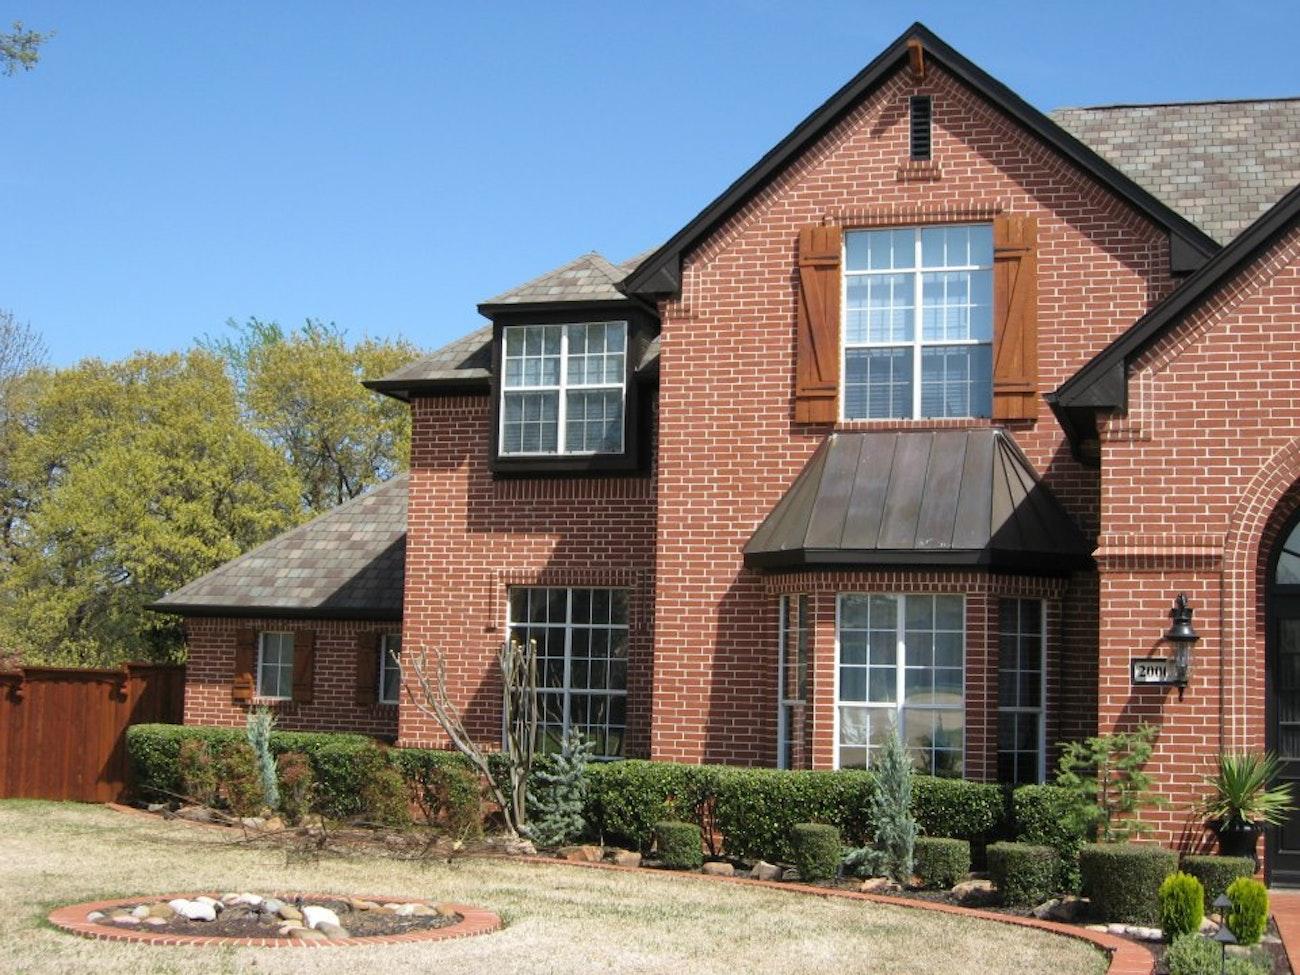 white-builder-grade-windows-with-red-brick